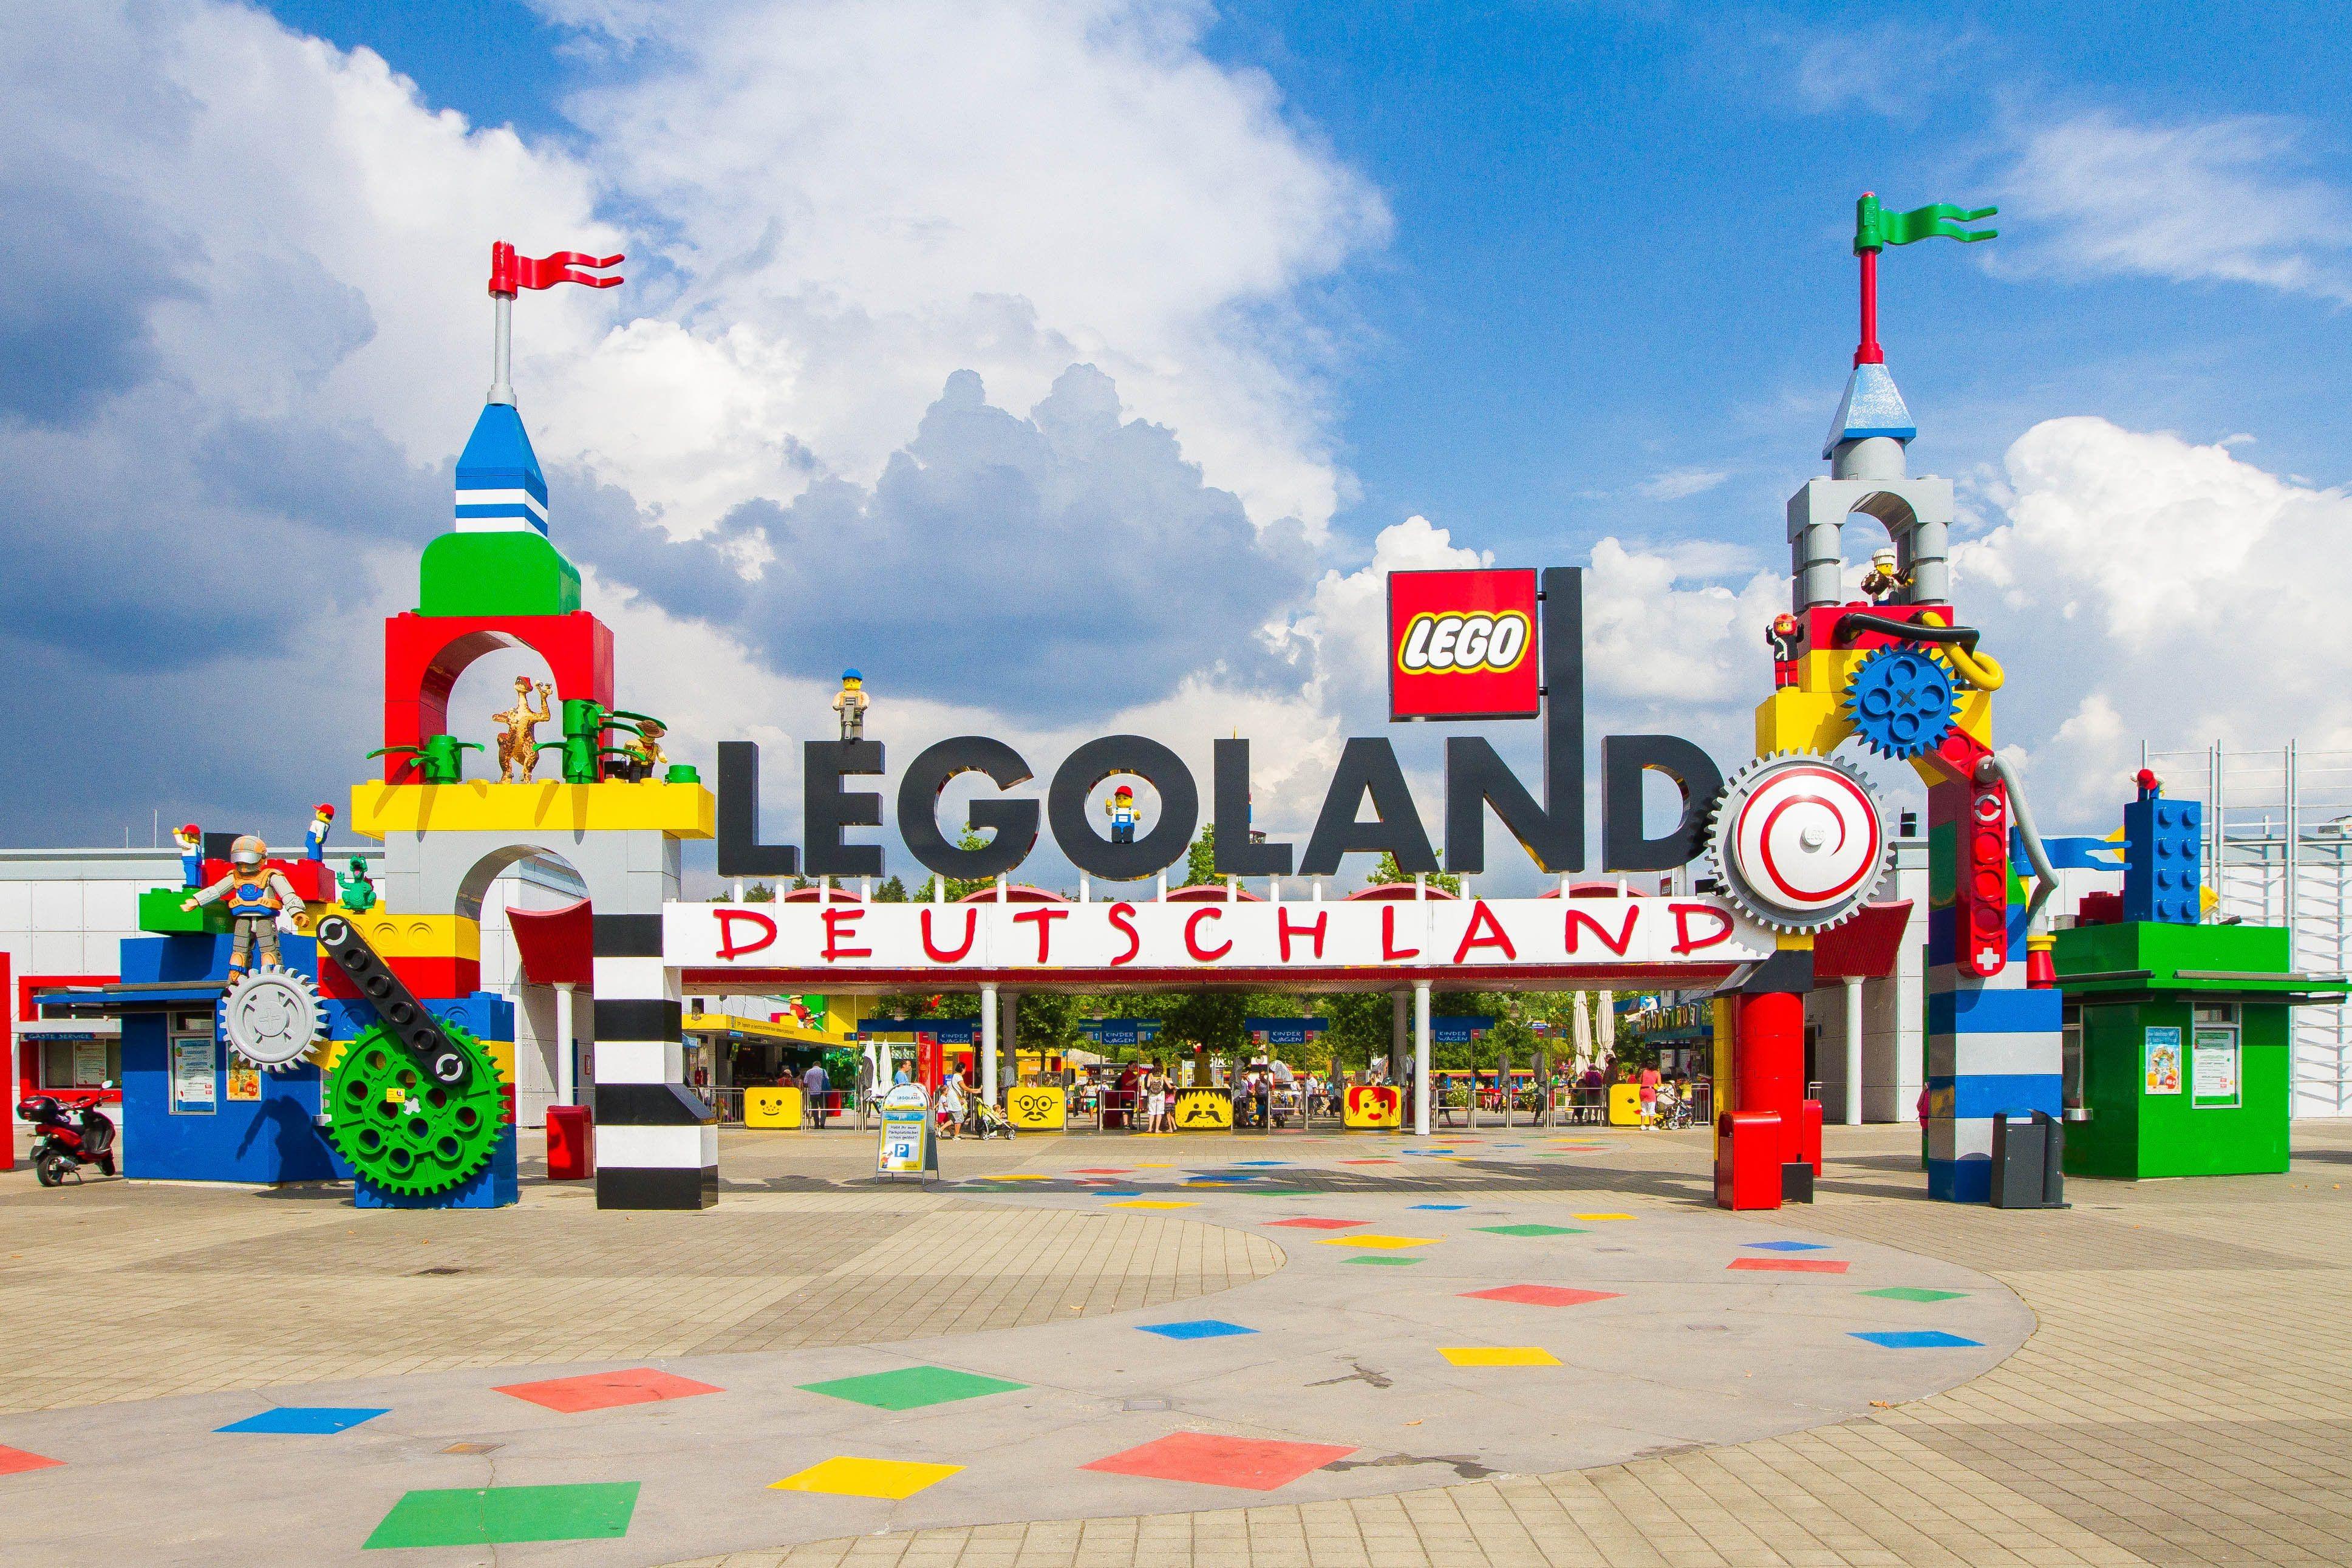 Legoland Deutschland Resort Legoland Deutschland Legoland Legoland Gunzburg